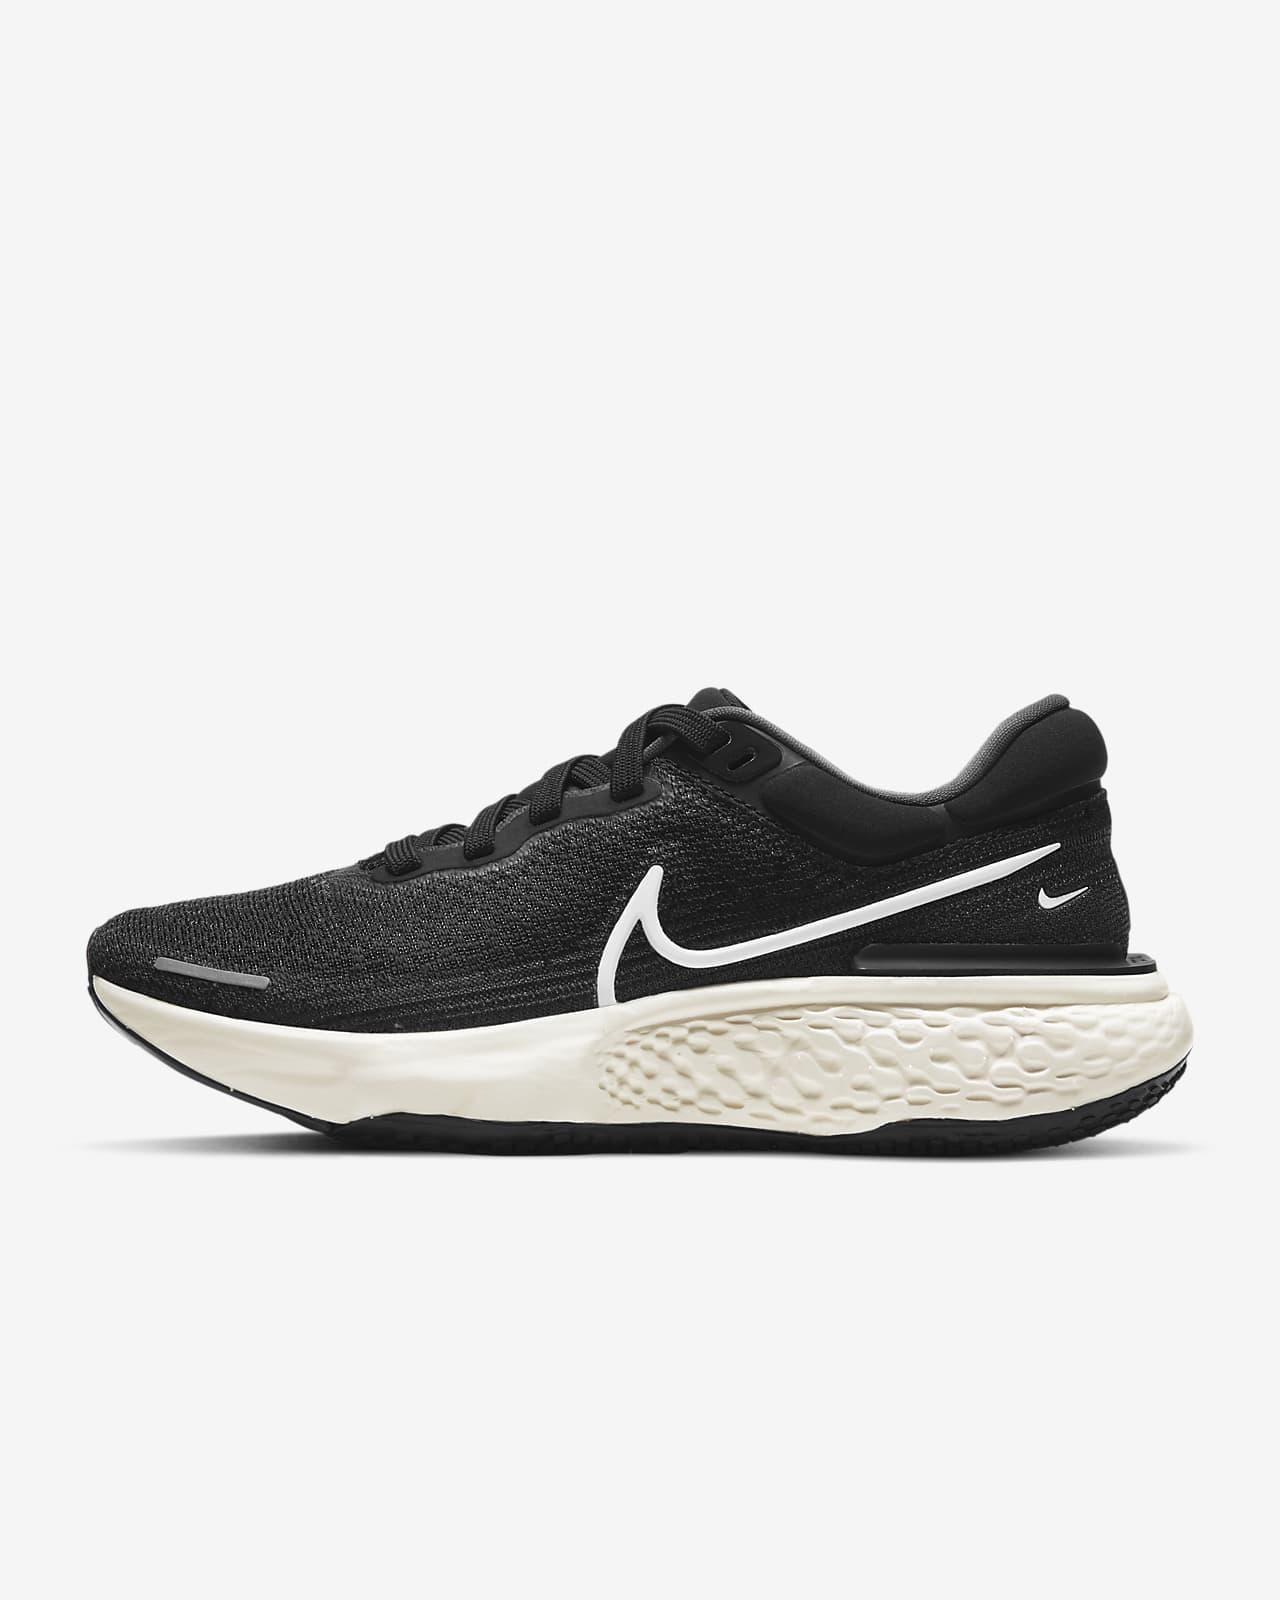 Calzado de running para carretera para mujer Nike ZoomX Invincible Run Flyknit